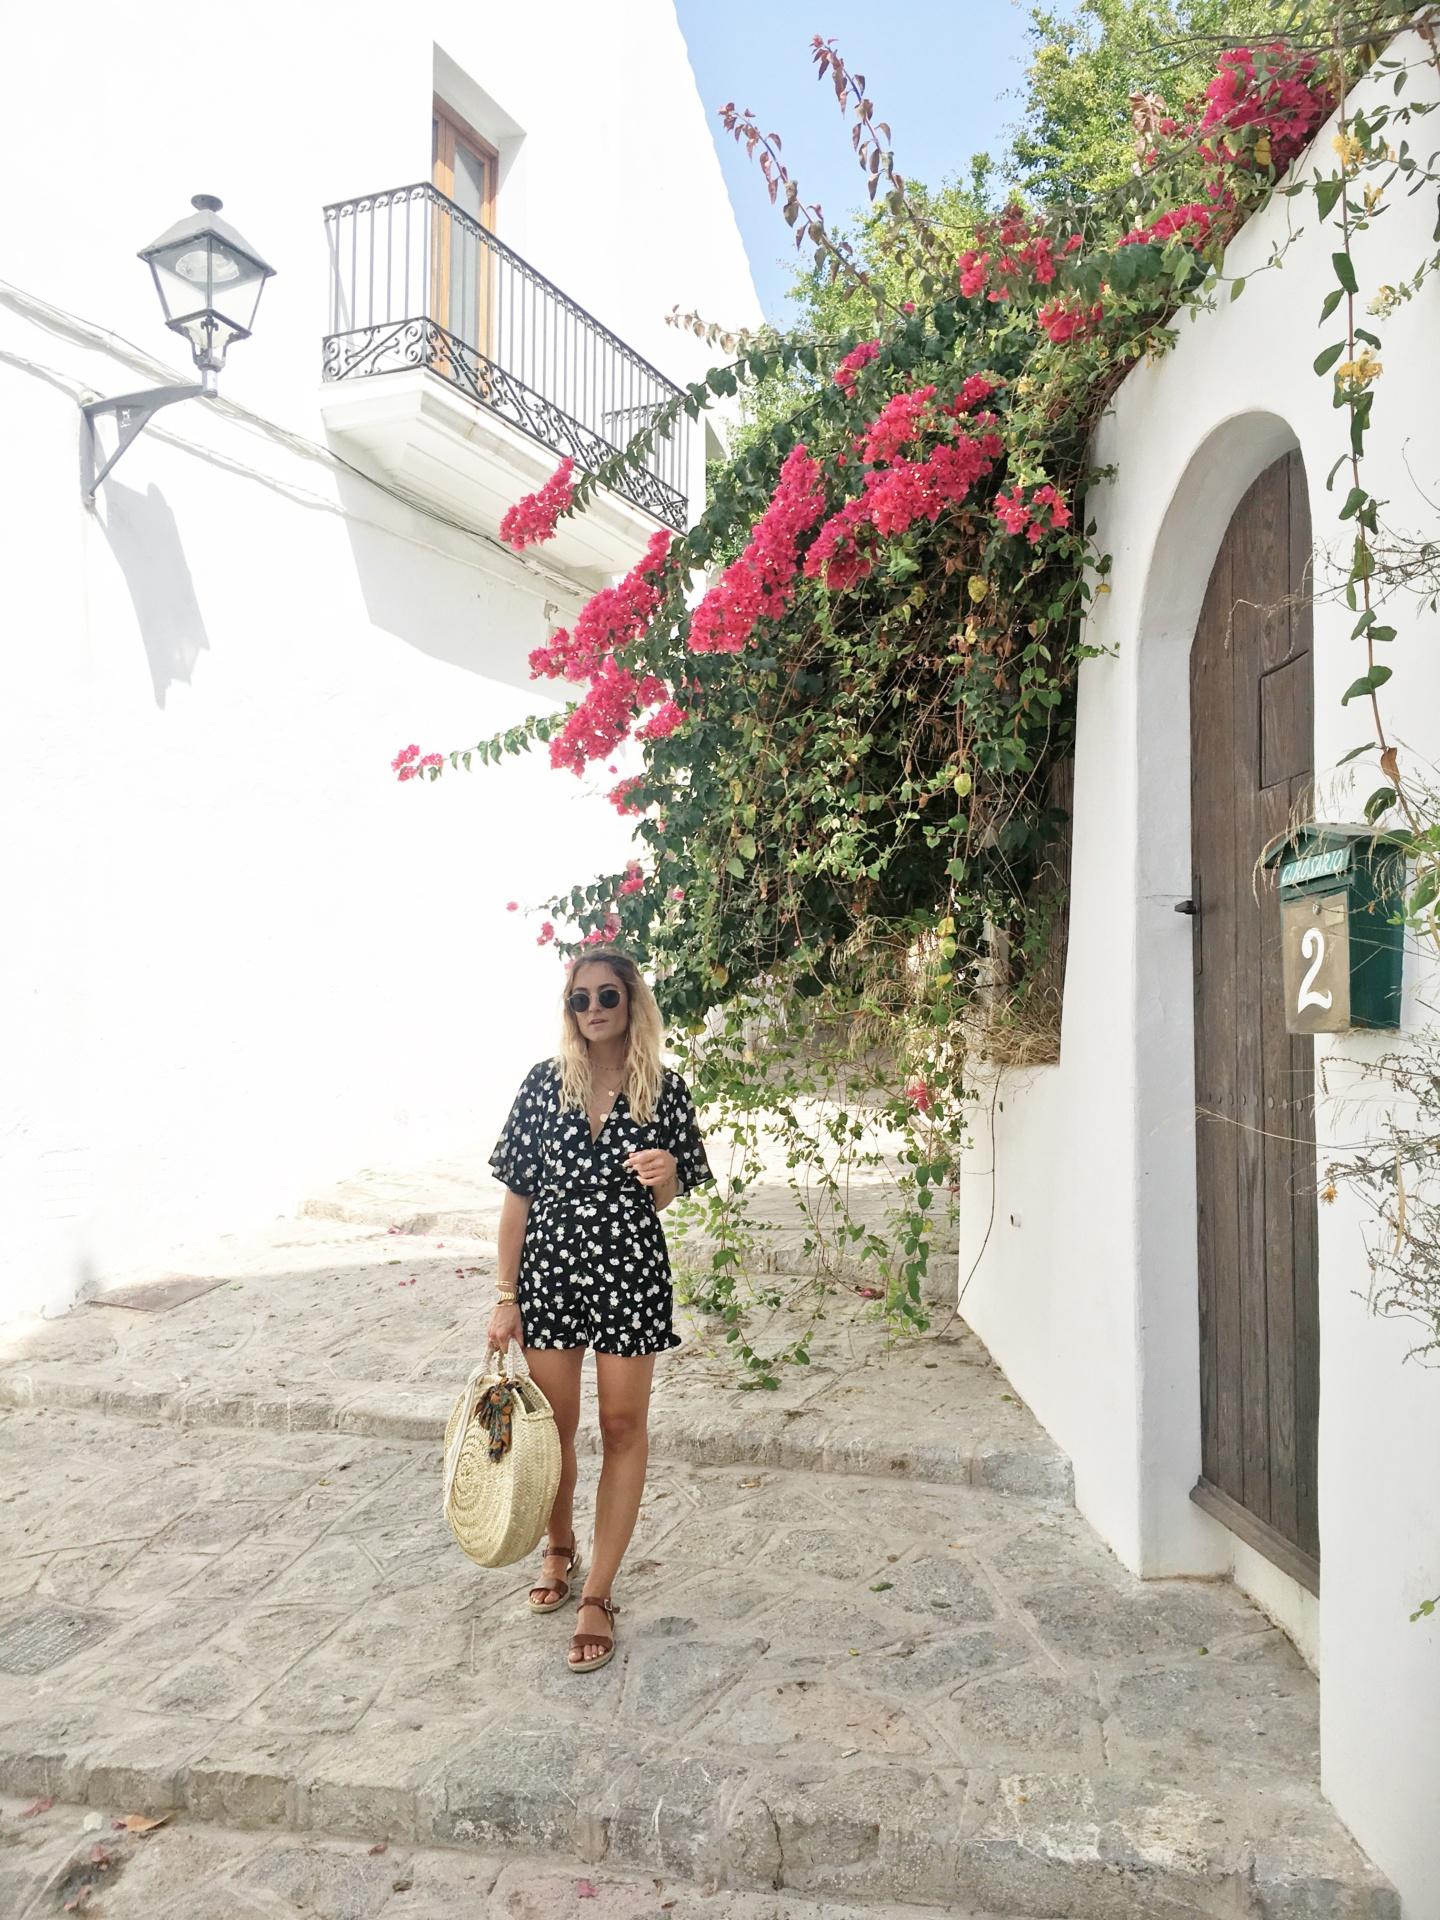 Veille ville Ibiza